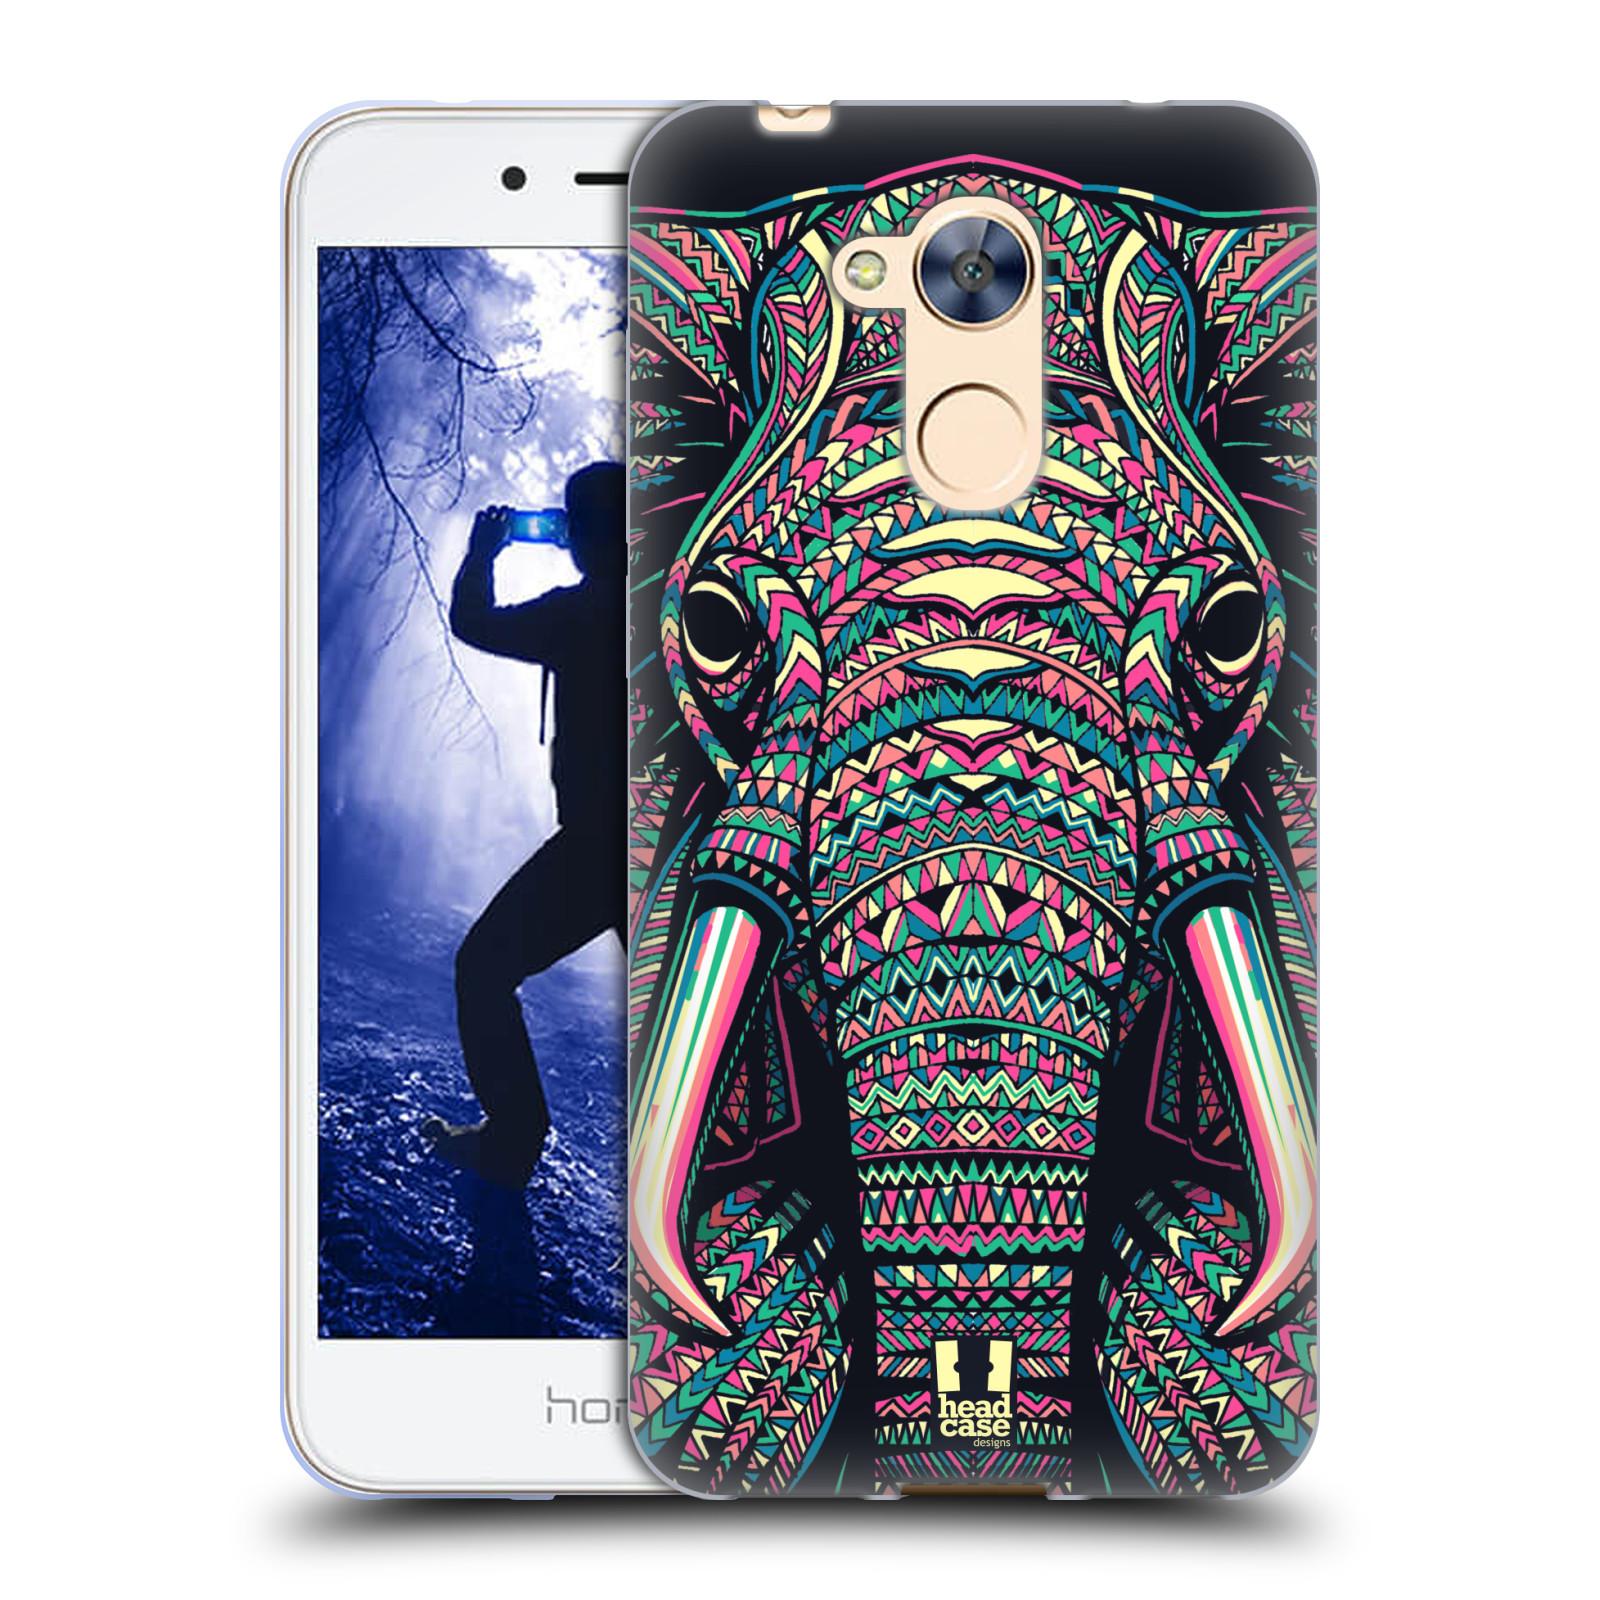 Silikonové pouzdro na mobil Honor 6A - Head Case - AZTEC SLON